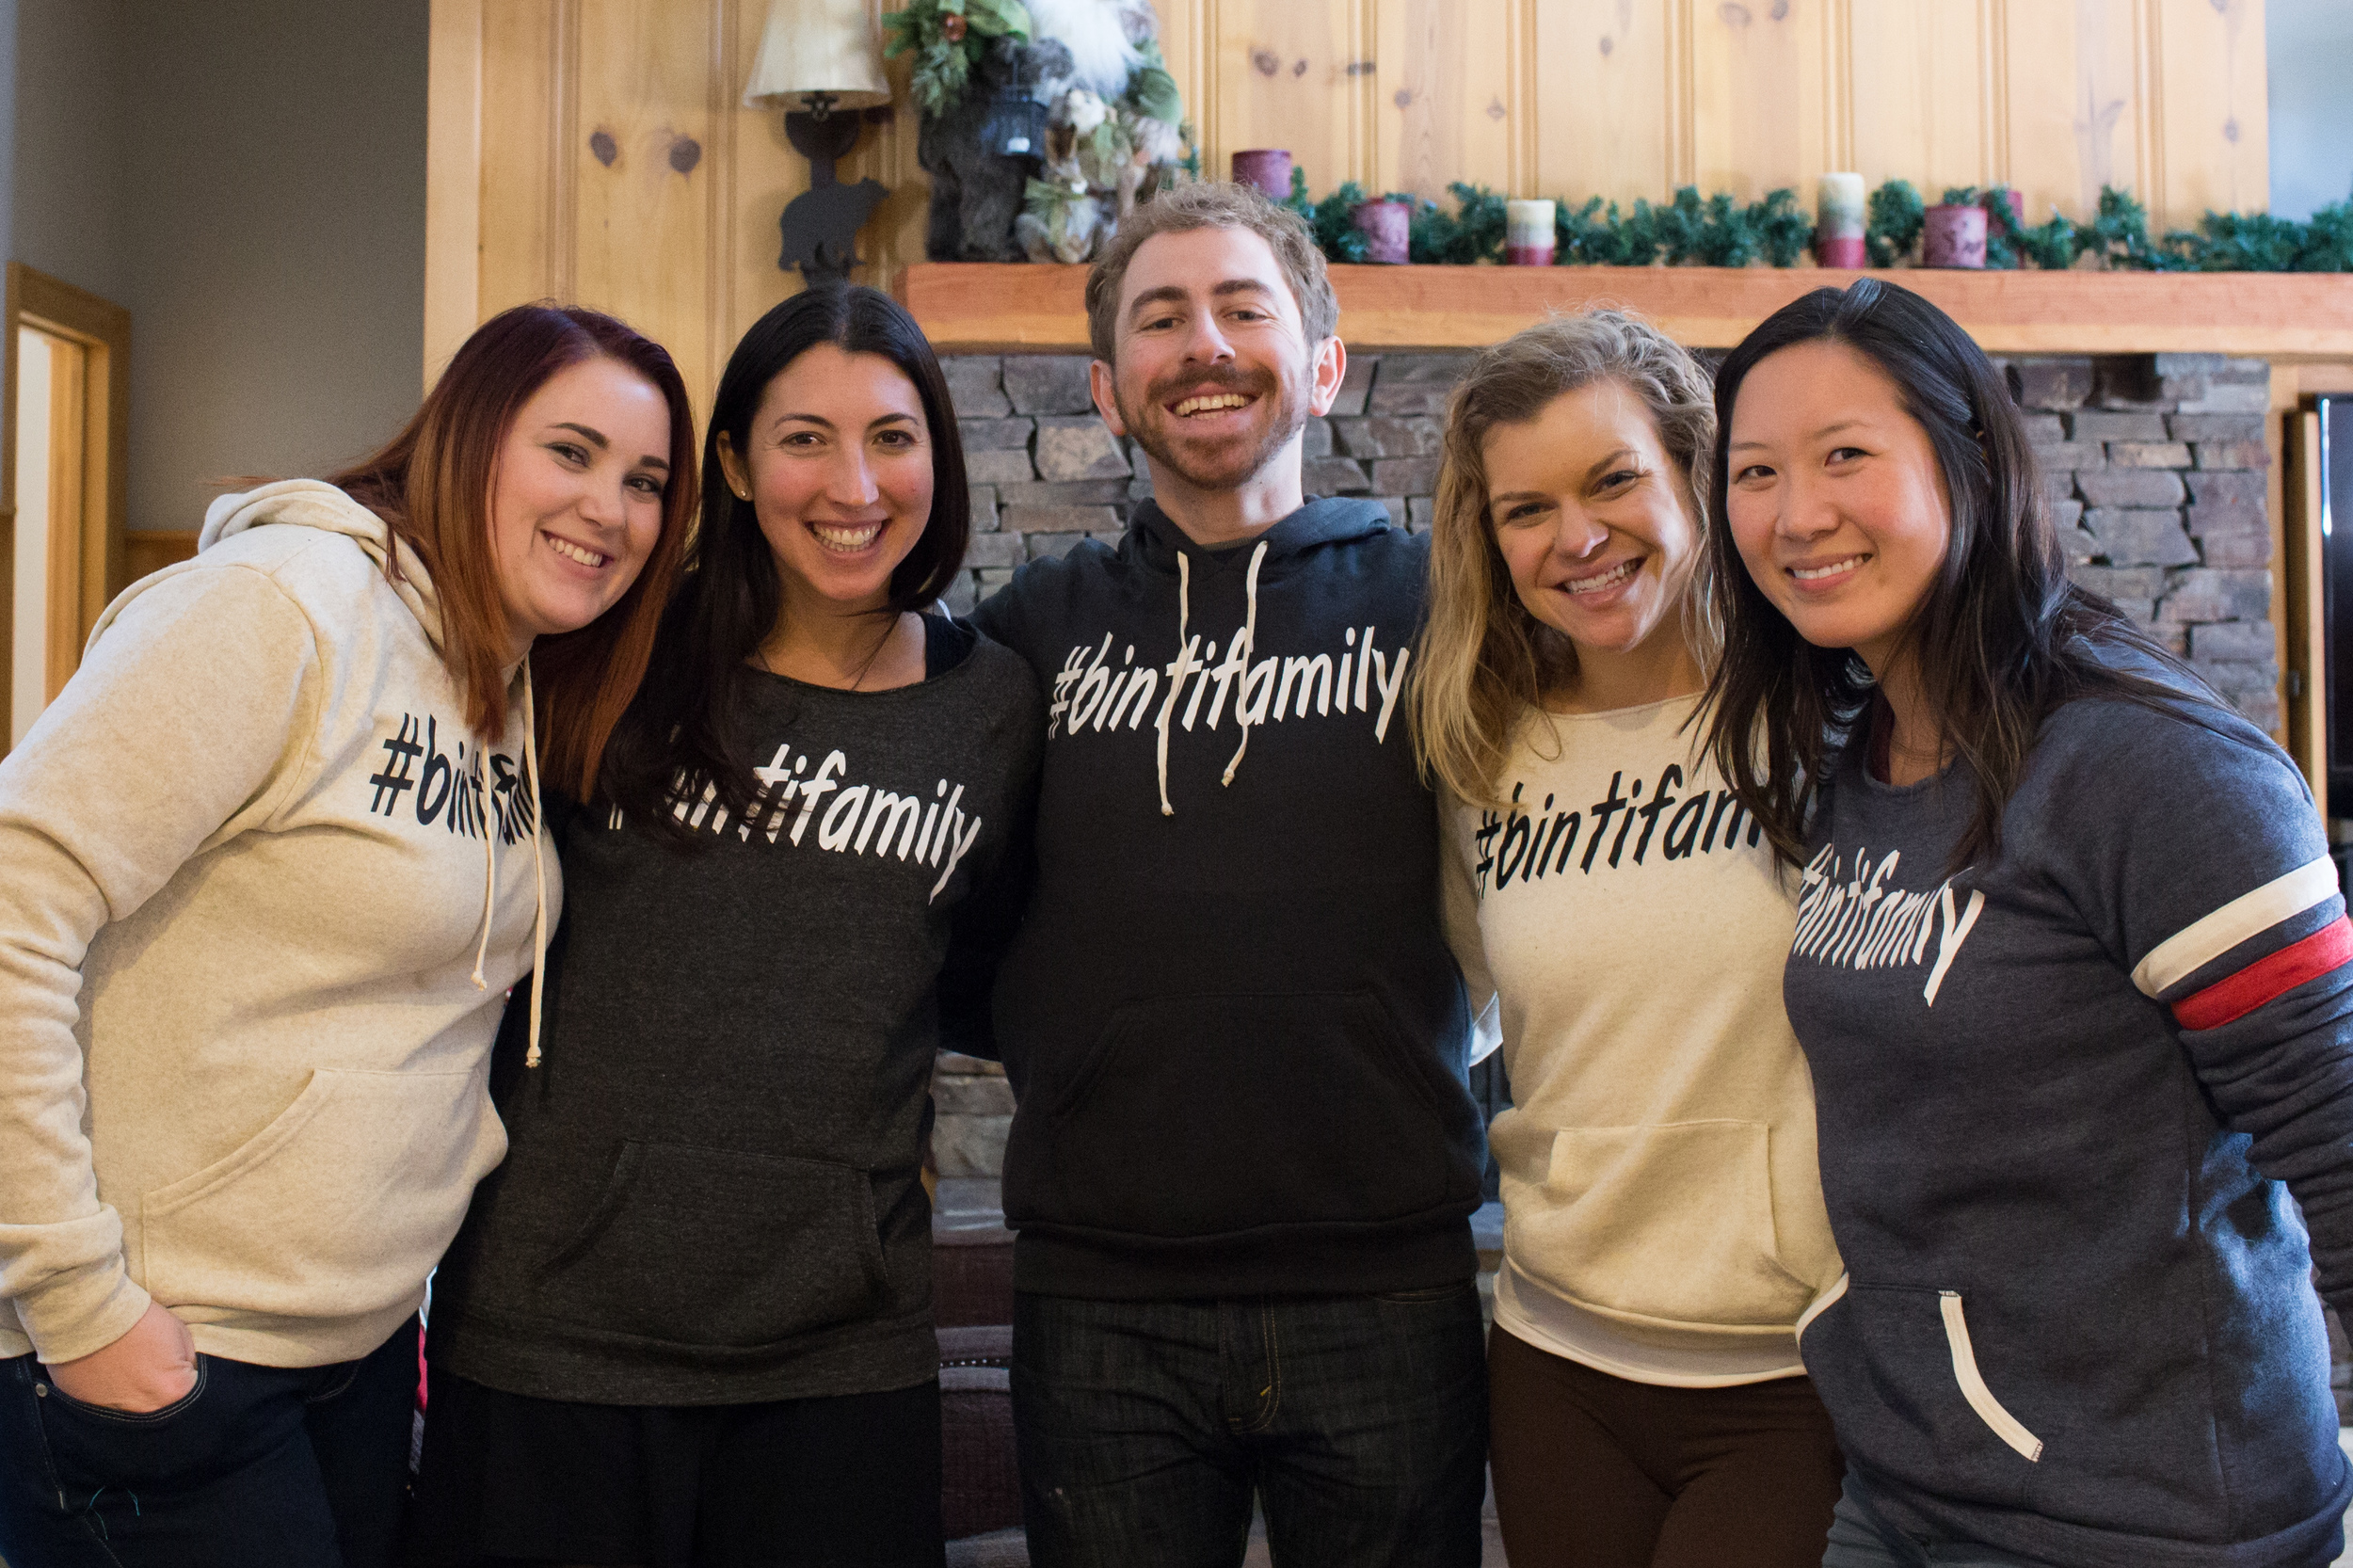 The #bintifamily at their Tahoe retreat